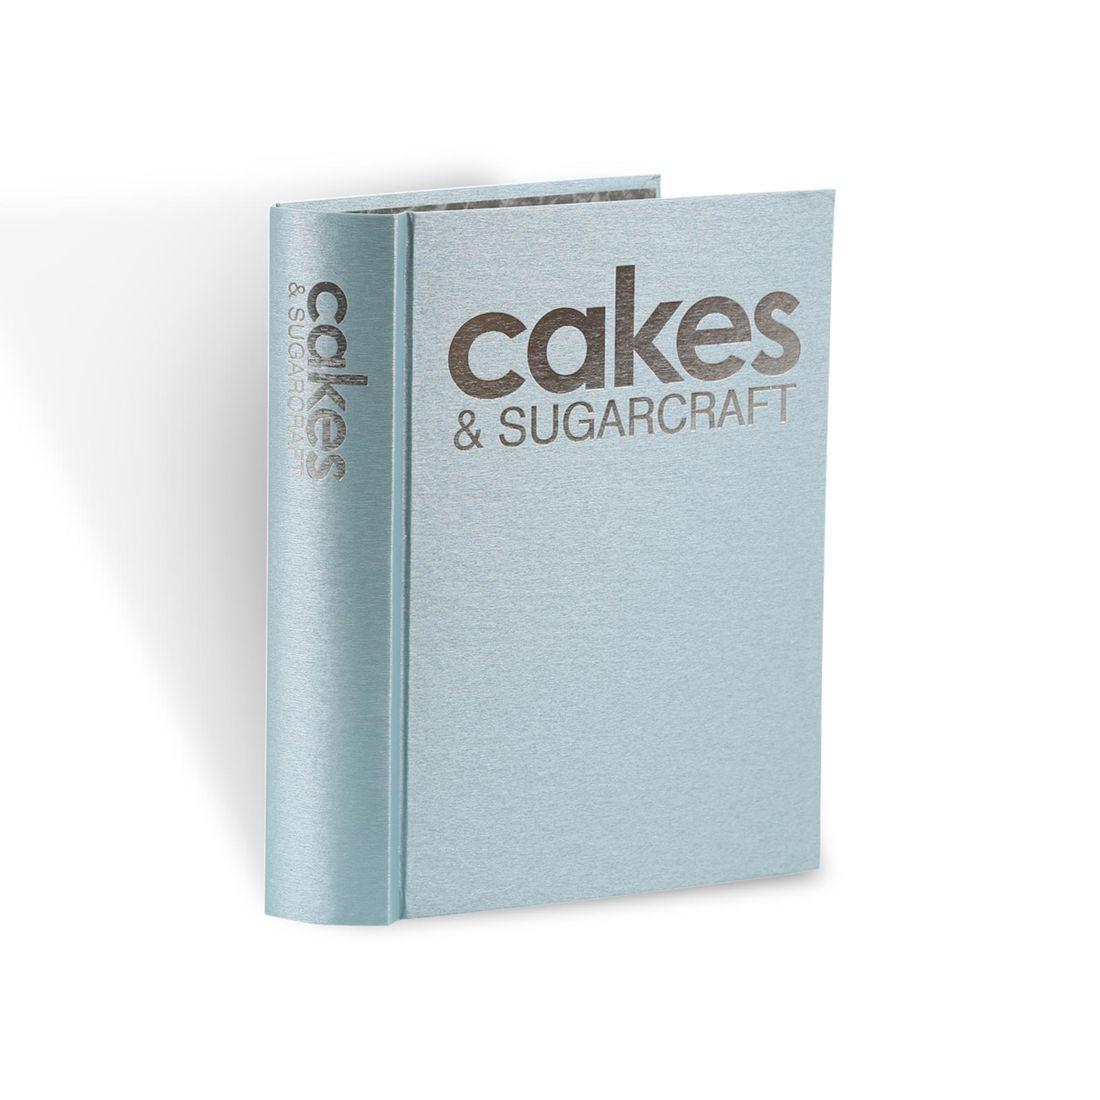 Cake Decorating Binder How To Use : Cakes & Sugarcraft Magazine Binder Squires Kitchen Shop ...